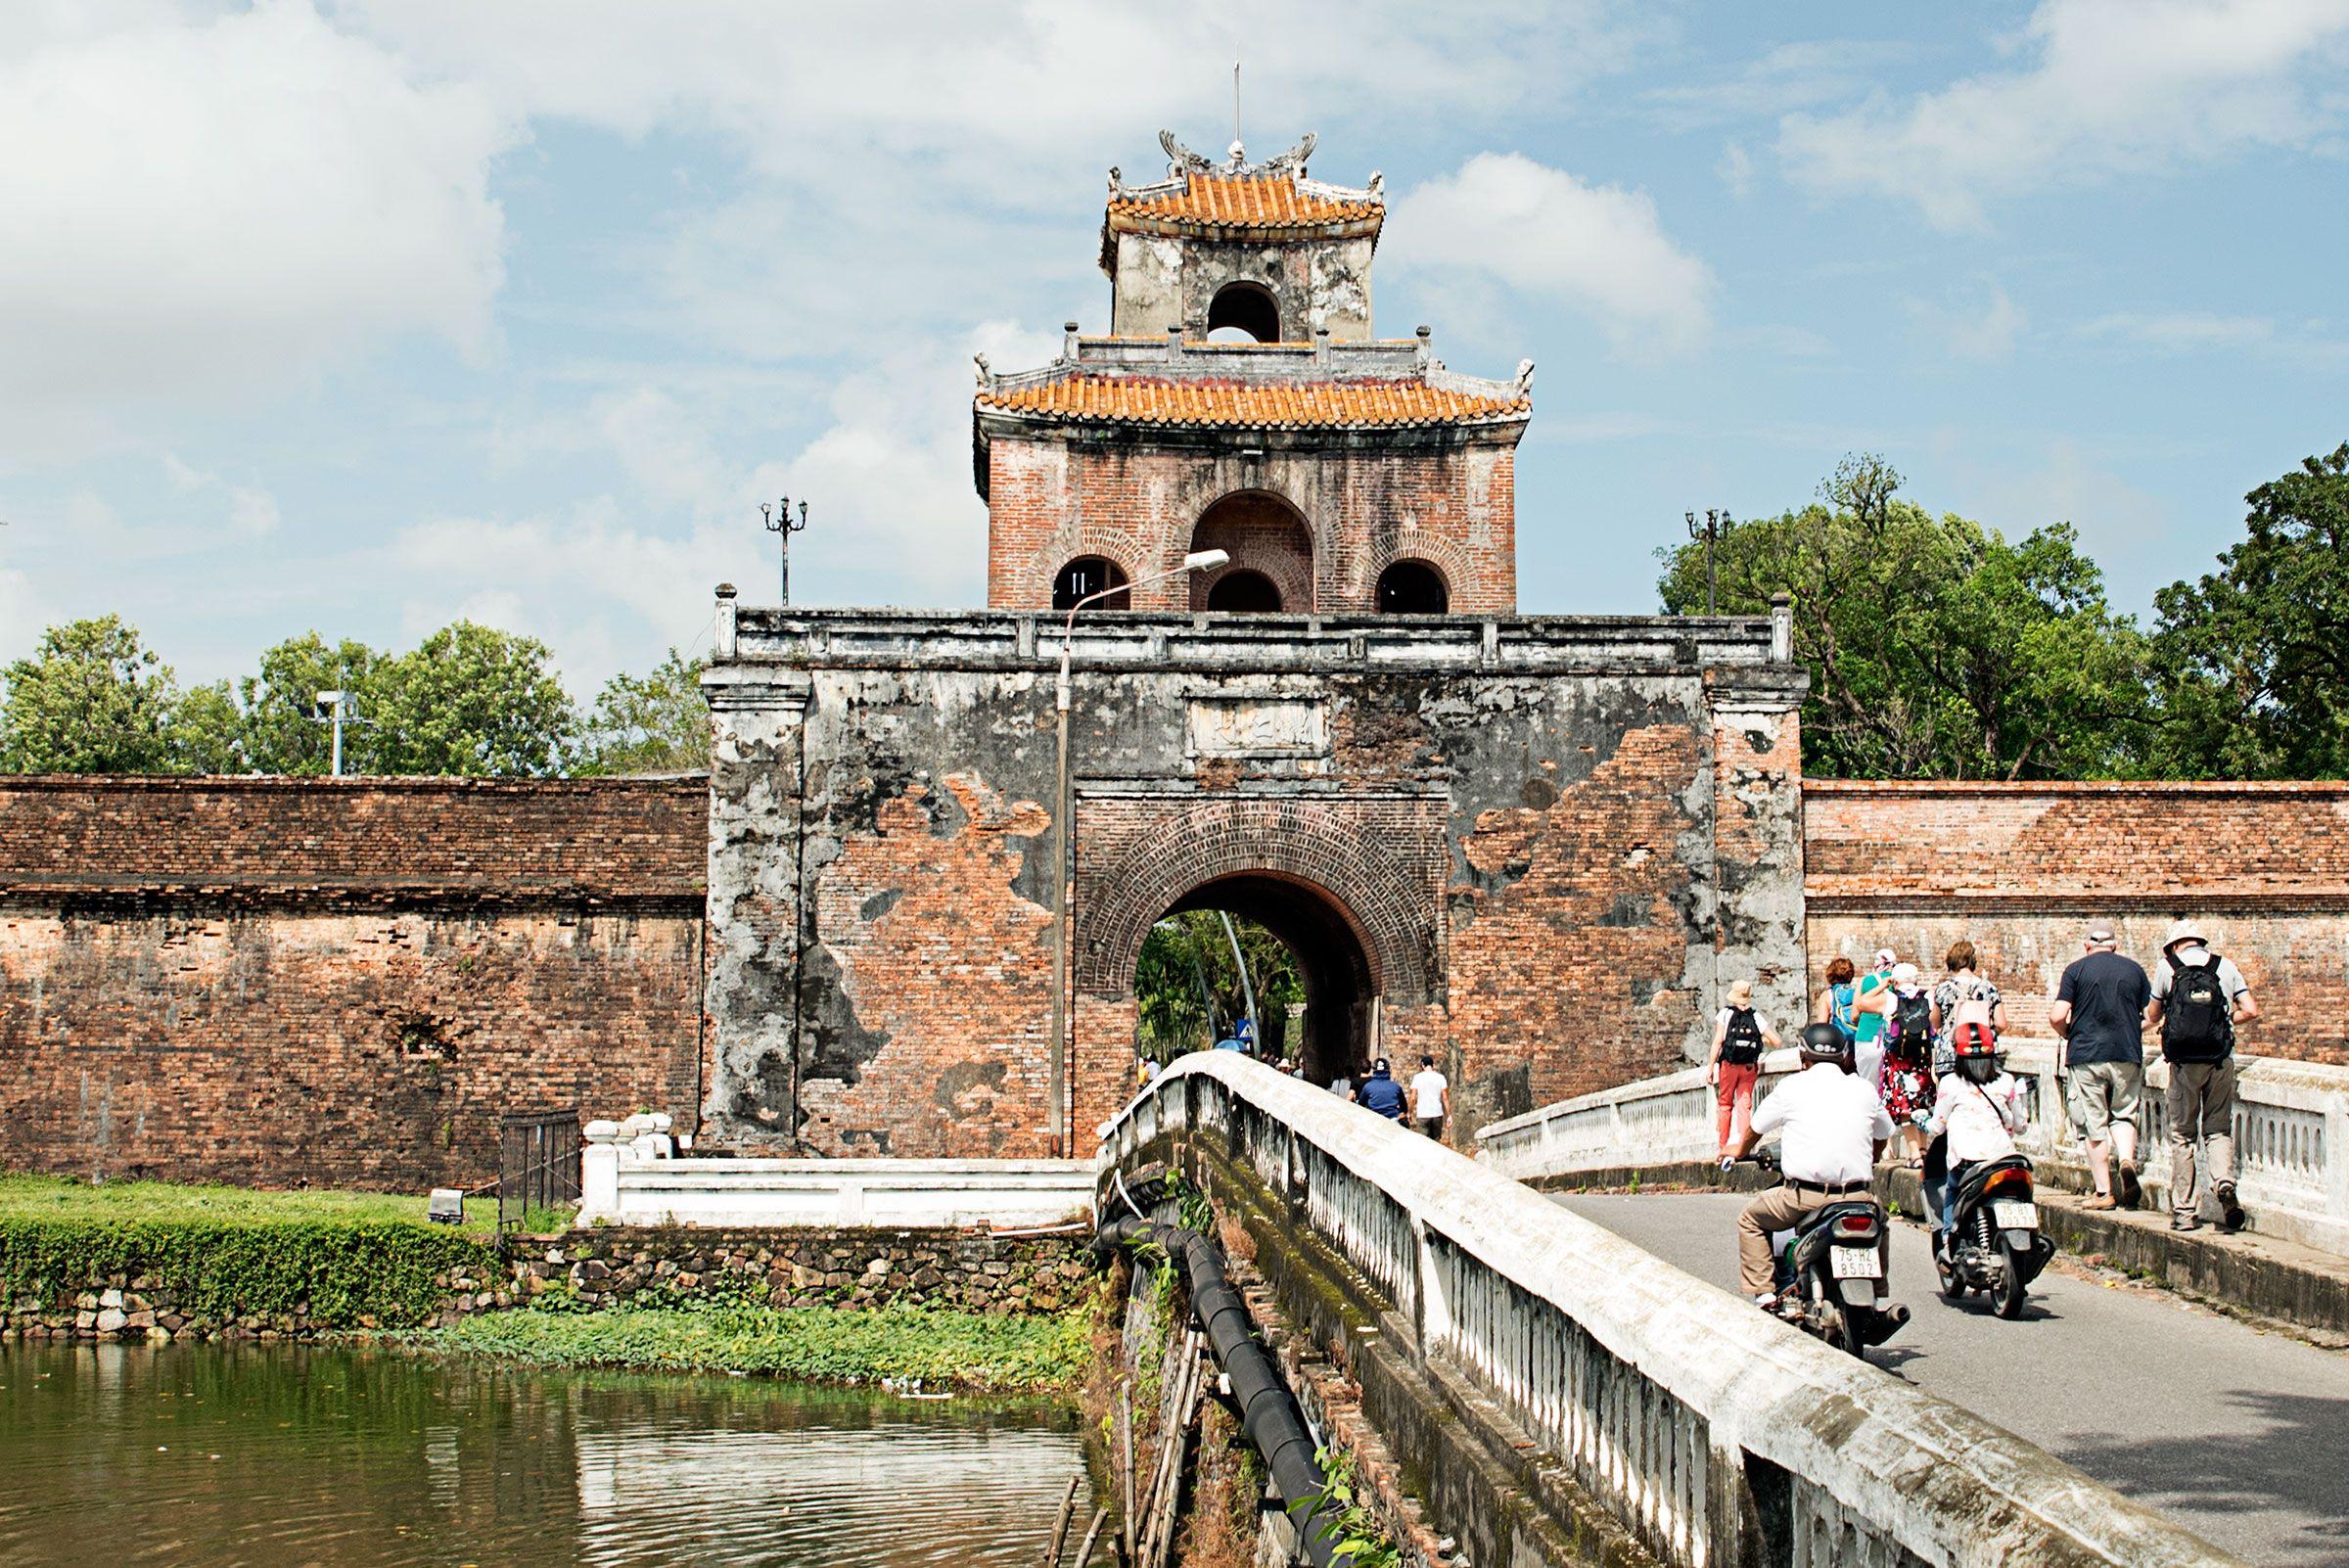 The Gate Tower At The Entrance Of Forbidden City Of Hue Vietnam Forbidden City Vietnam Travel Vietnam